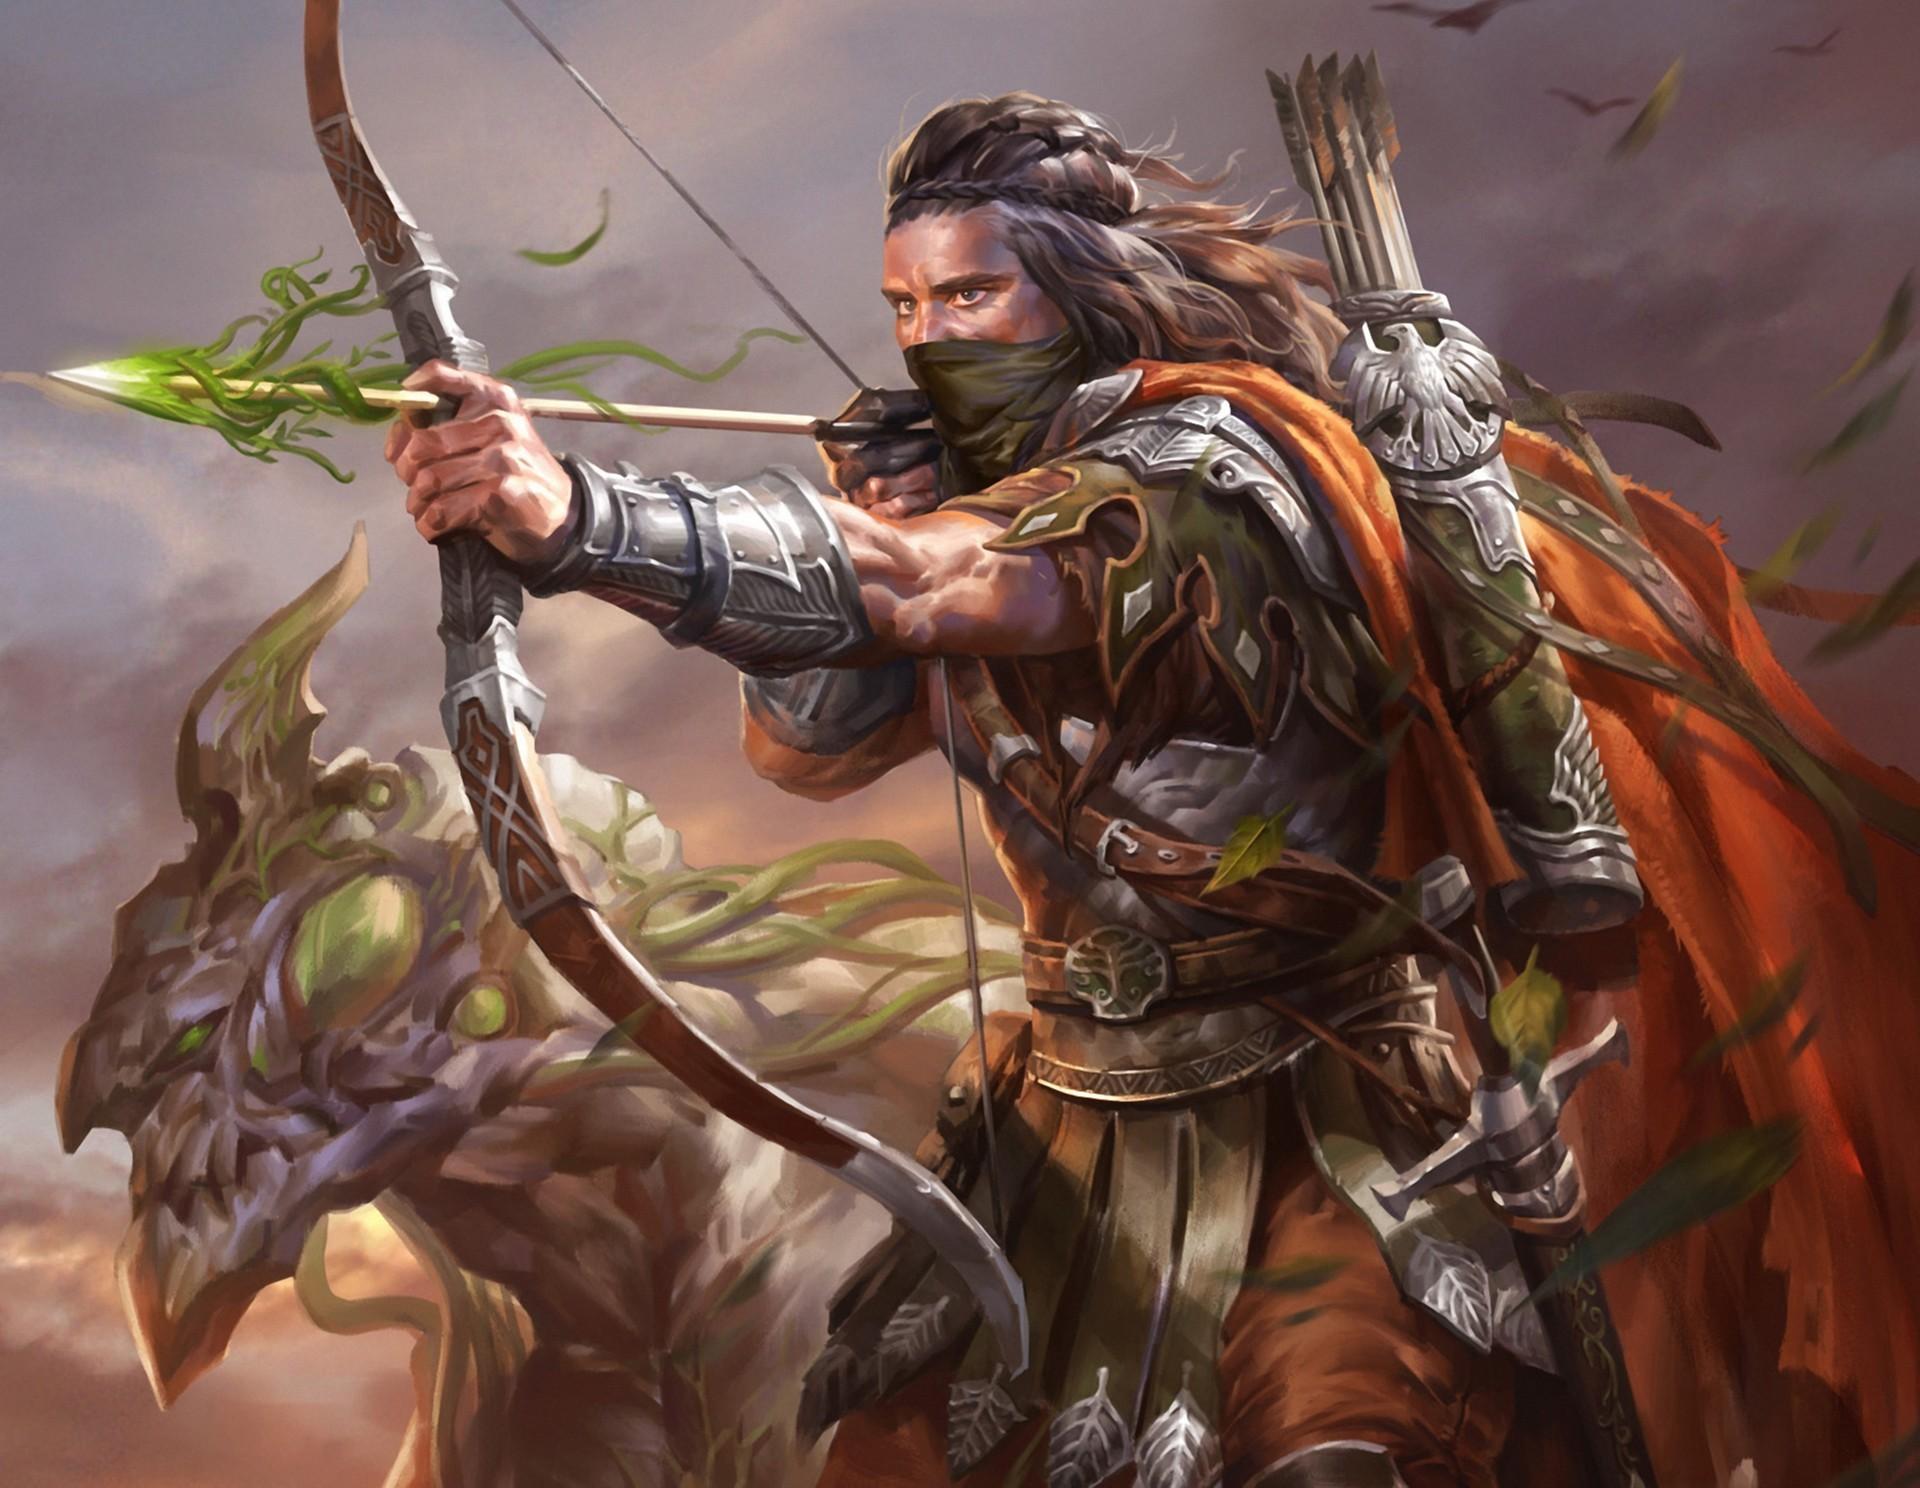 General 1920x1488 Legend of the Cryptids artwork fantasy art warrior armor archer arrows